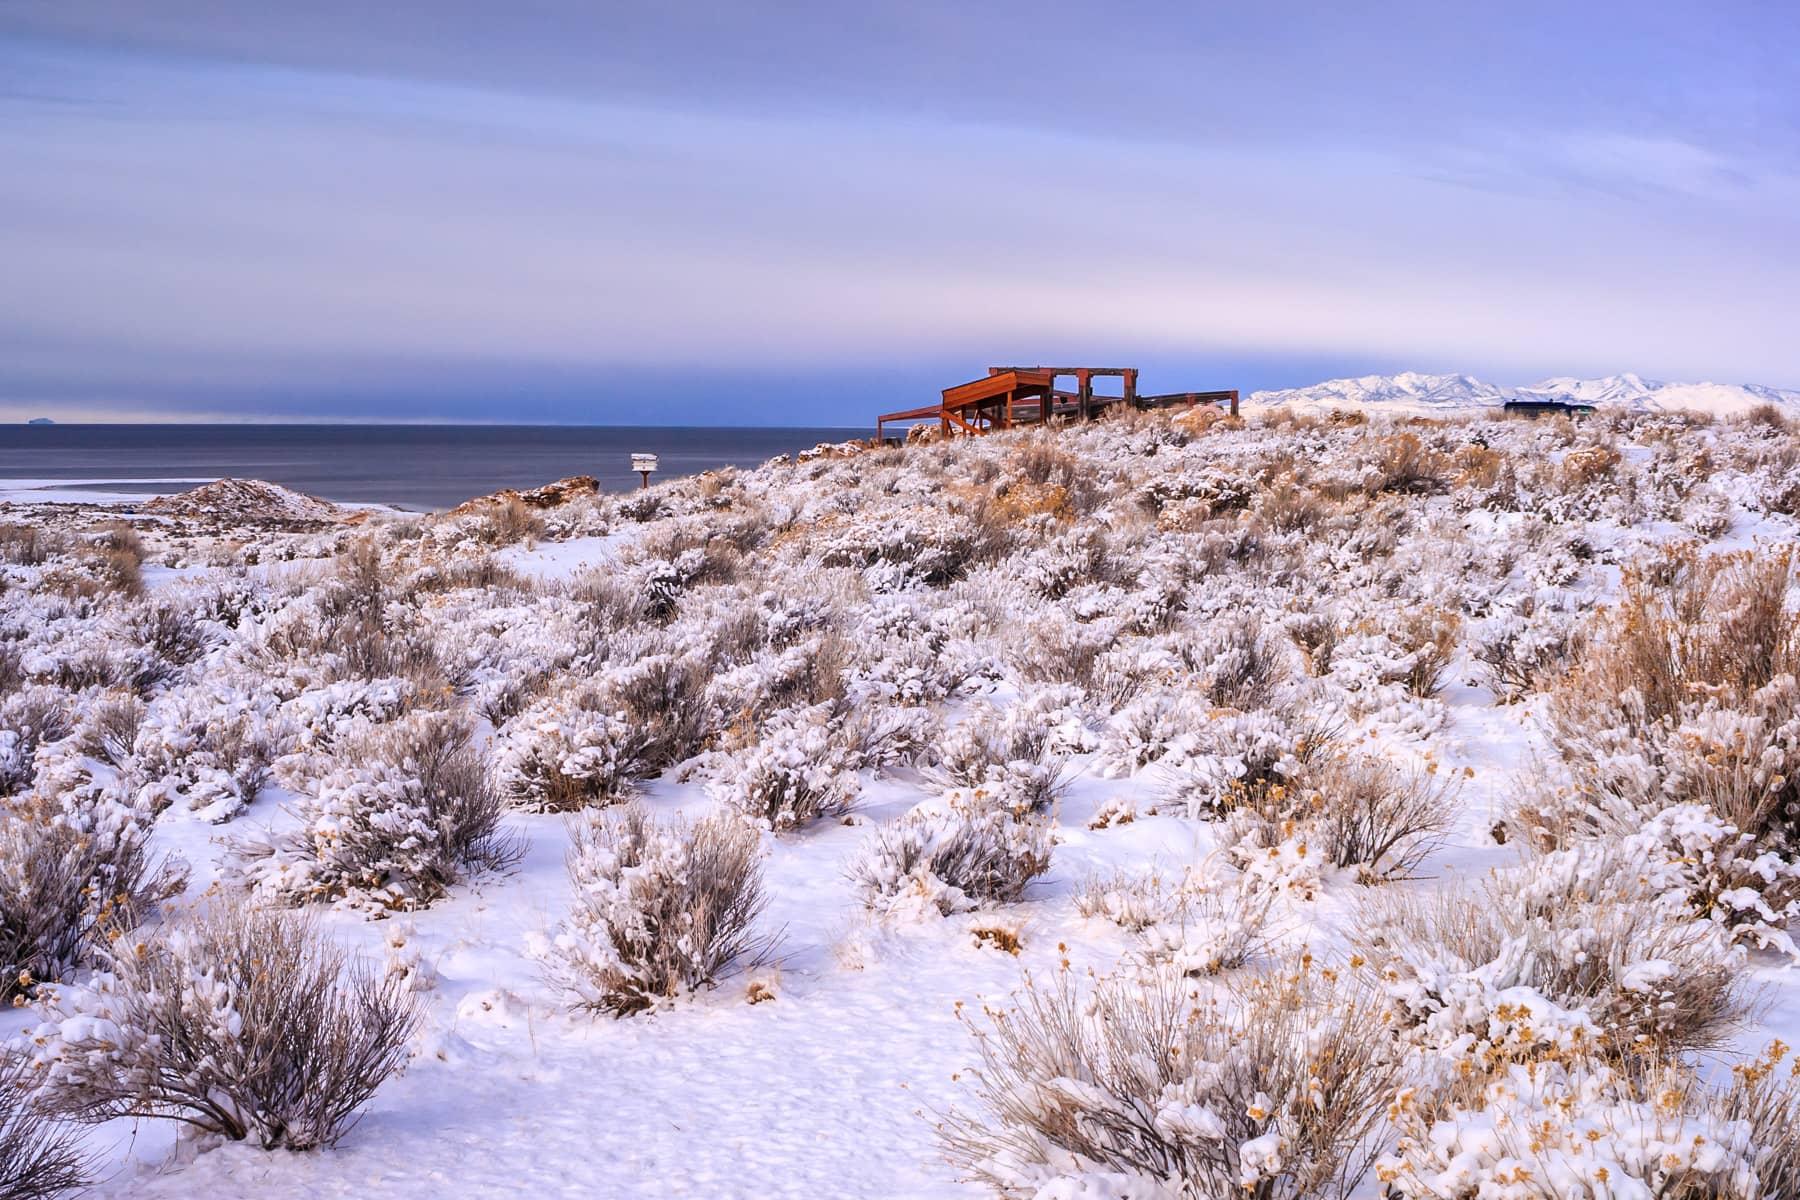 The visitors center in winter at Antelope Island State Park, Utah.